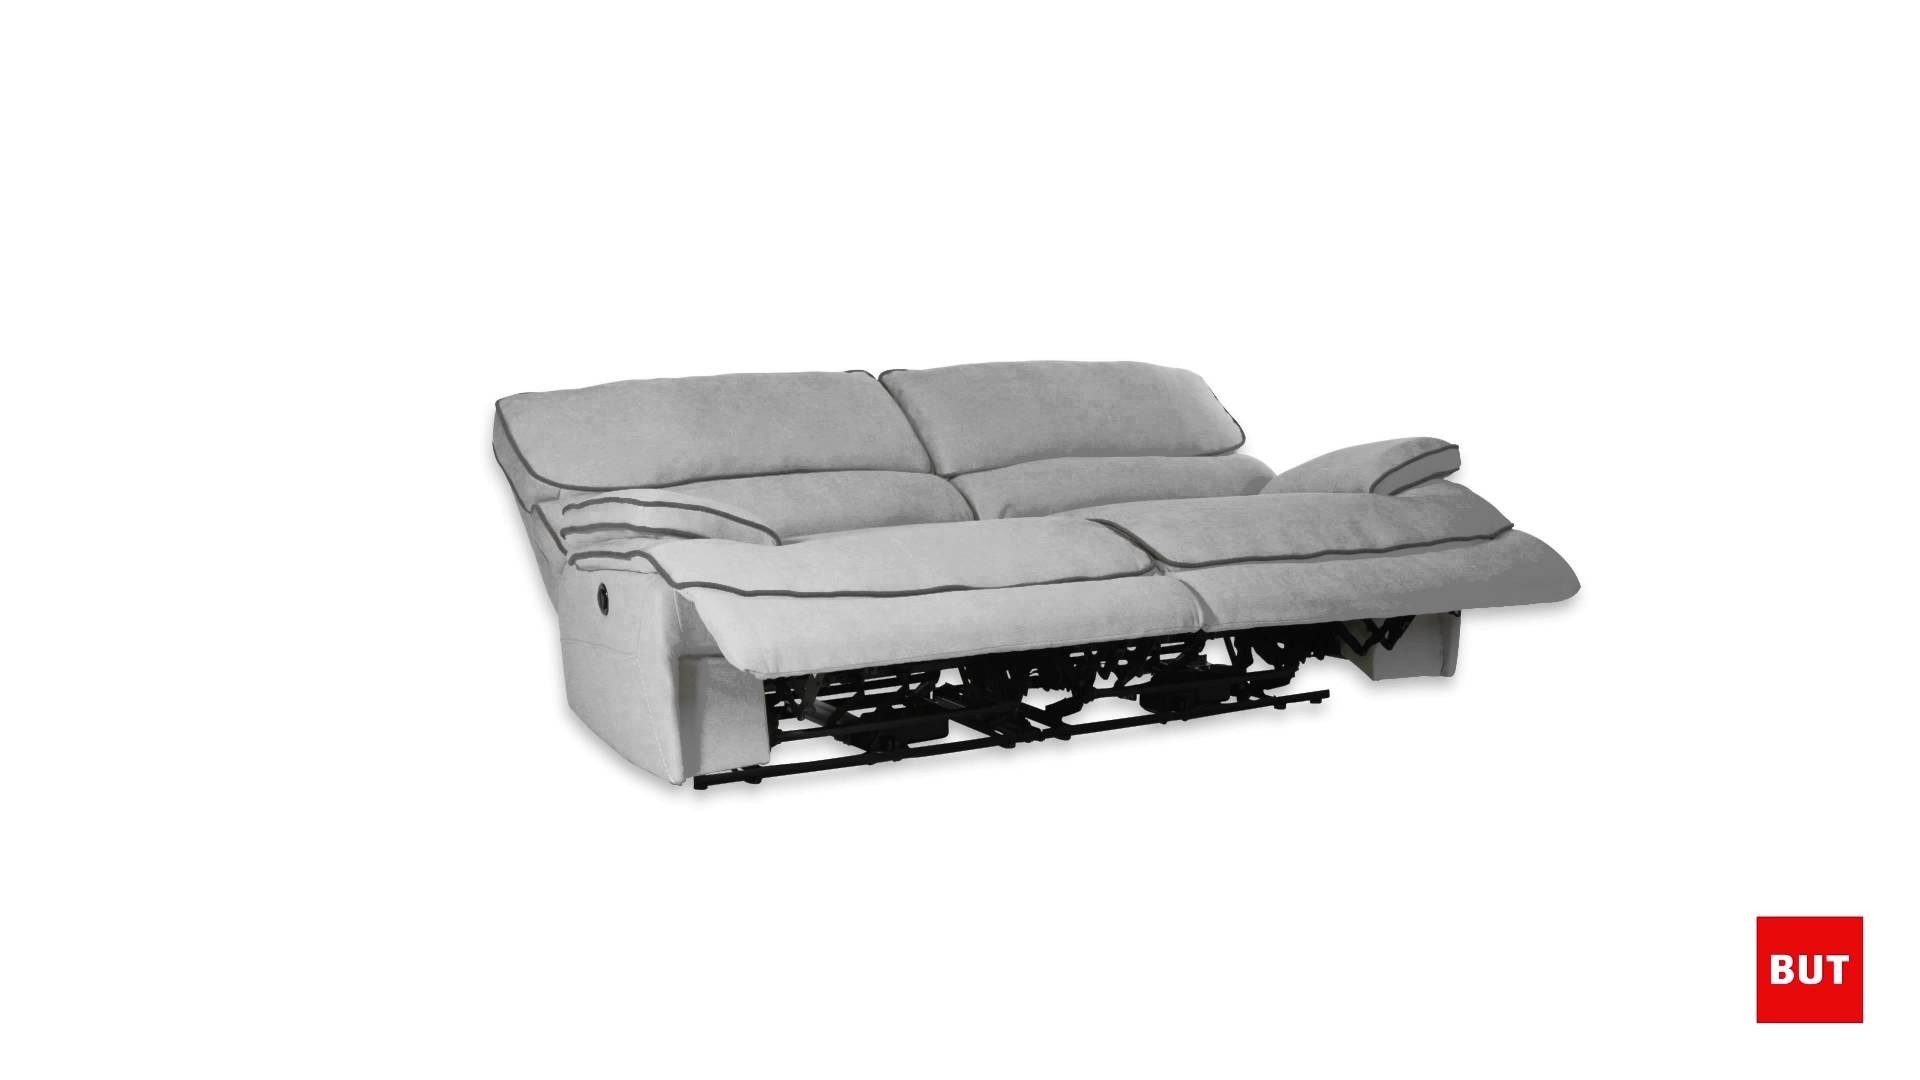 Canapé Angle Cuir Ikea Frais Collection Lit Armoire Canapé Beautiful Canap En U Convertible 12 Full Canape D